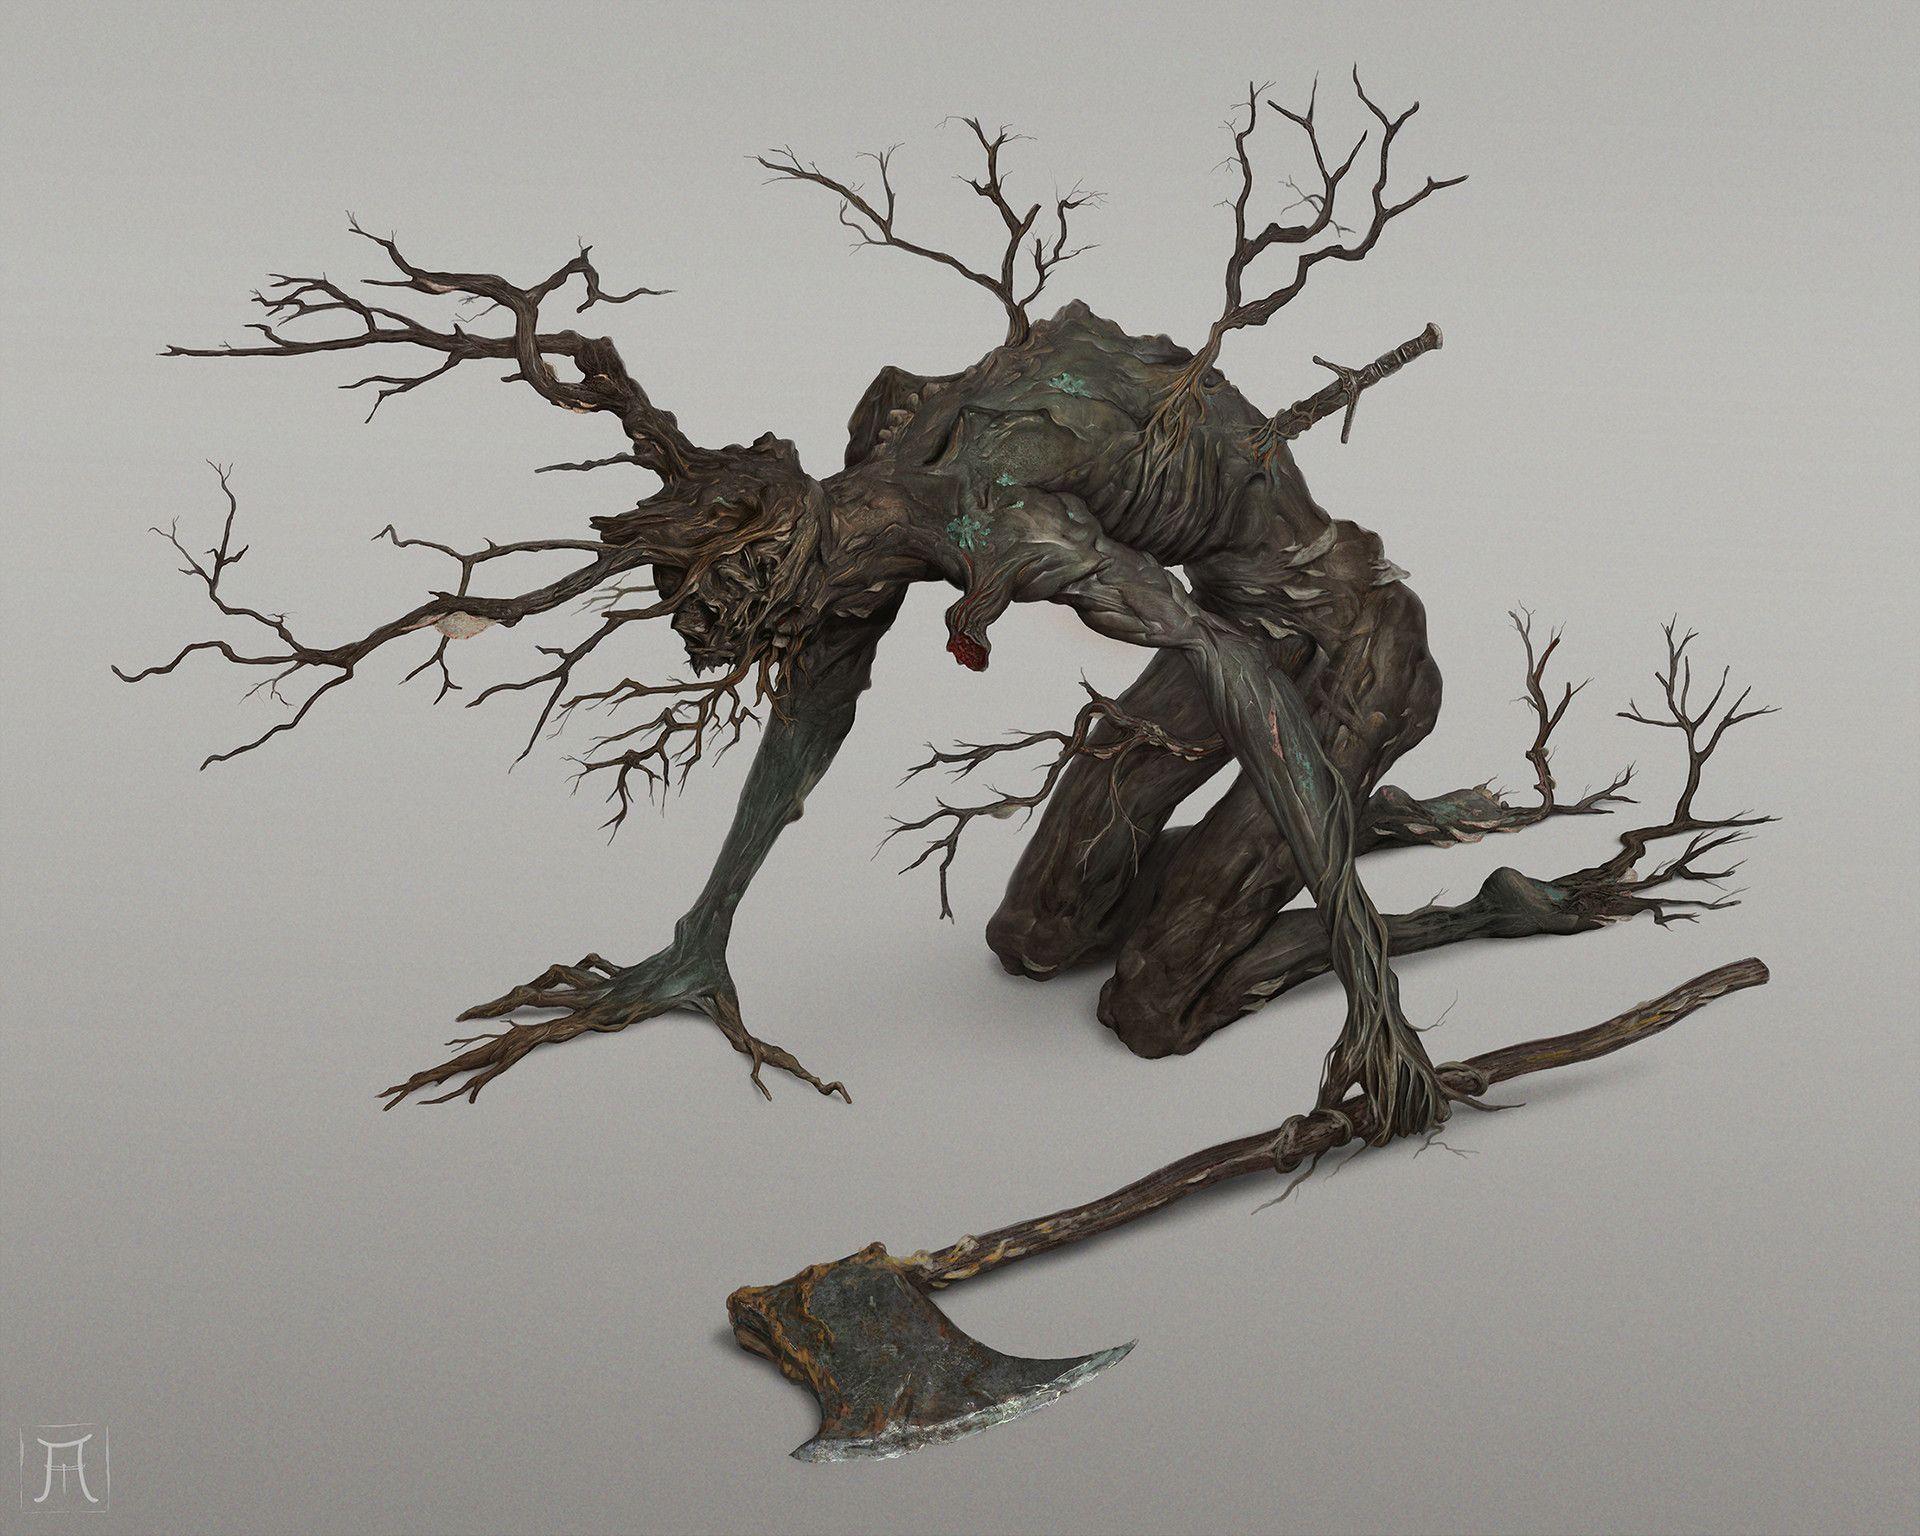 ArtStation - Curse Rotted Man, Igor Krstic